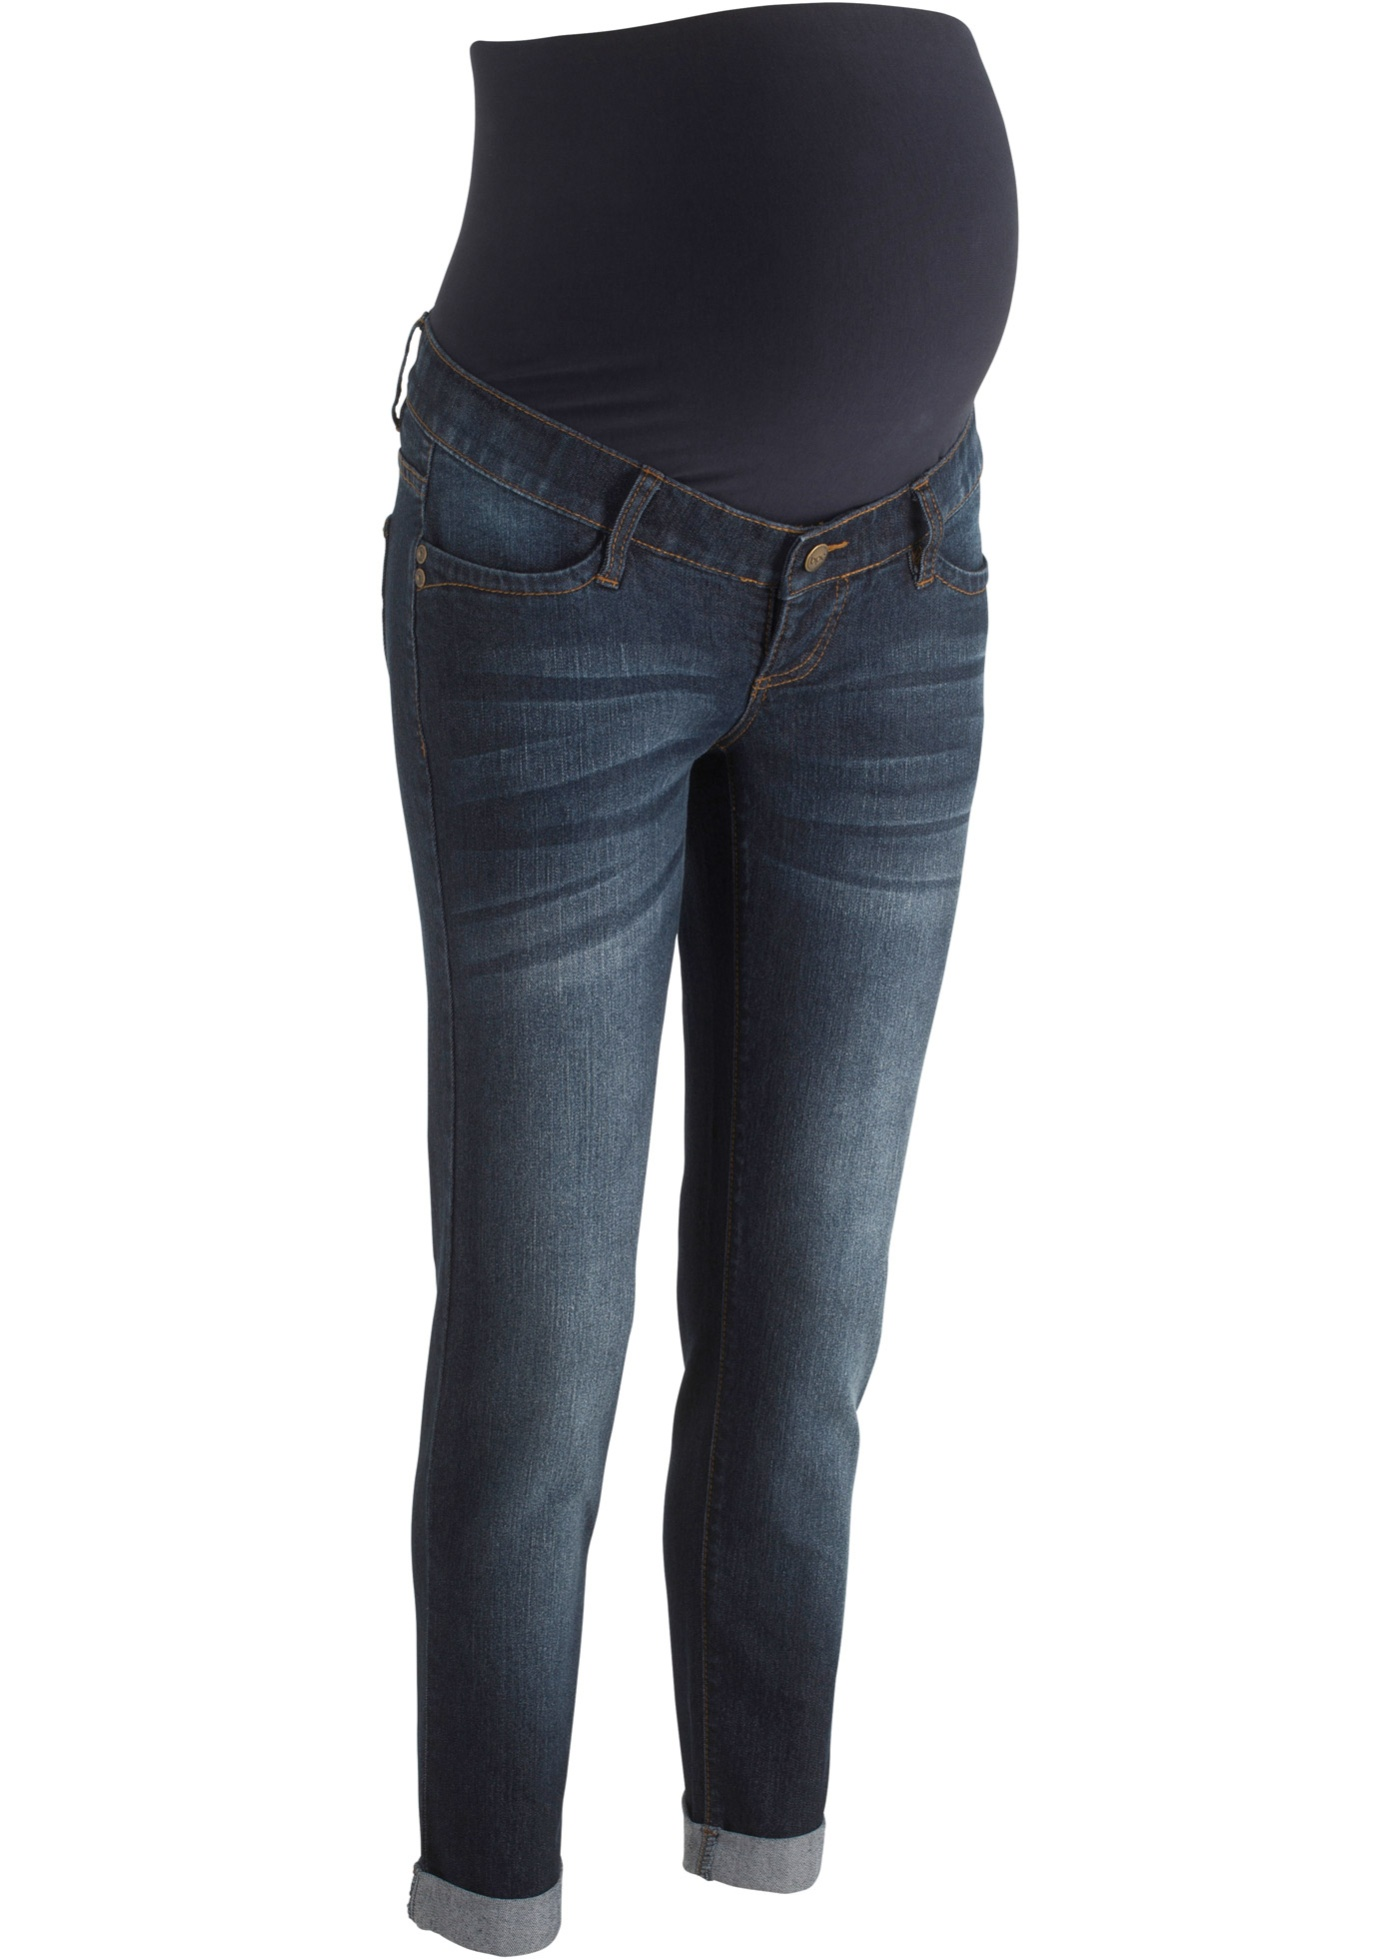 Bonprix CollectionJean De Bpc 7 Bleu Pour GrossesseLongueur Femme 8 IeYWH2bED9